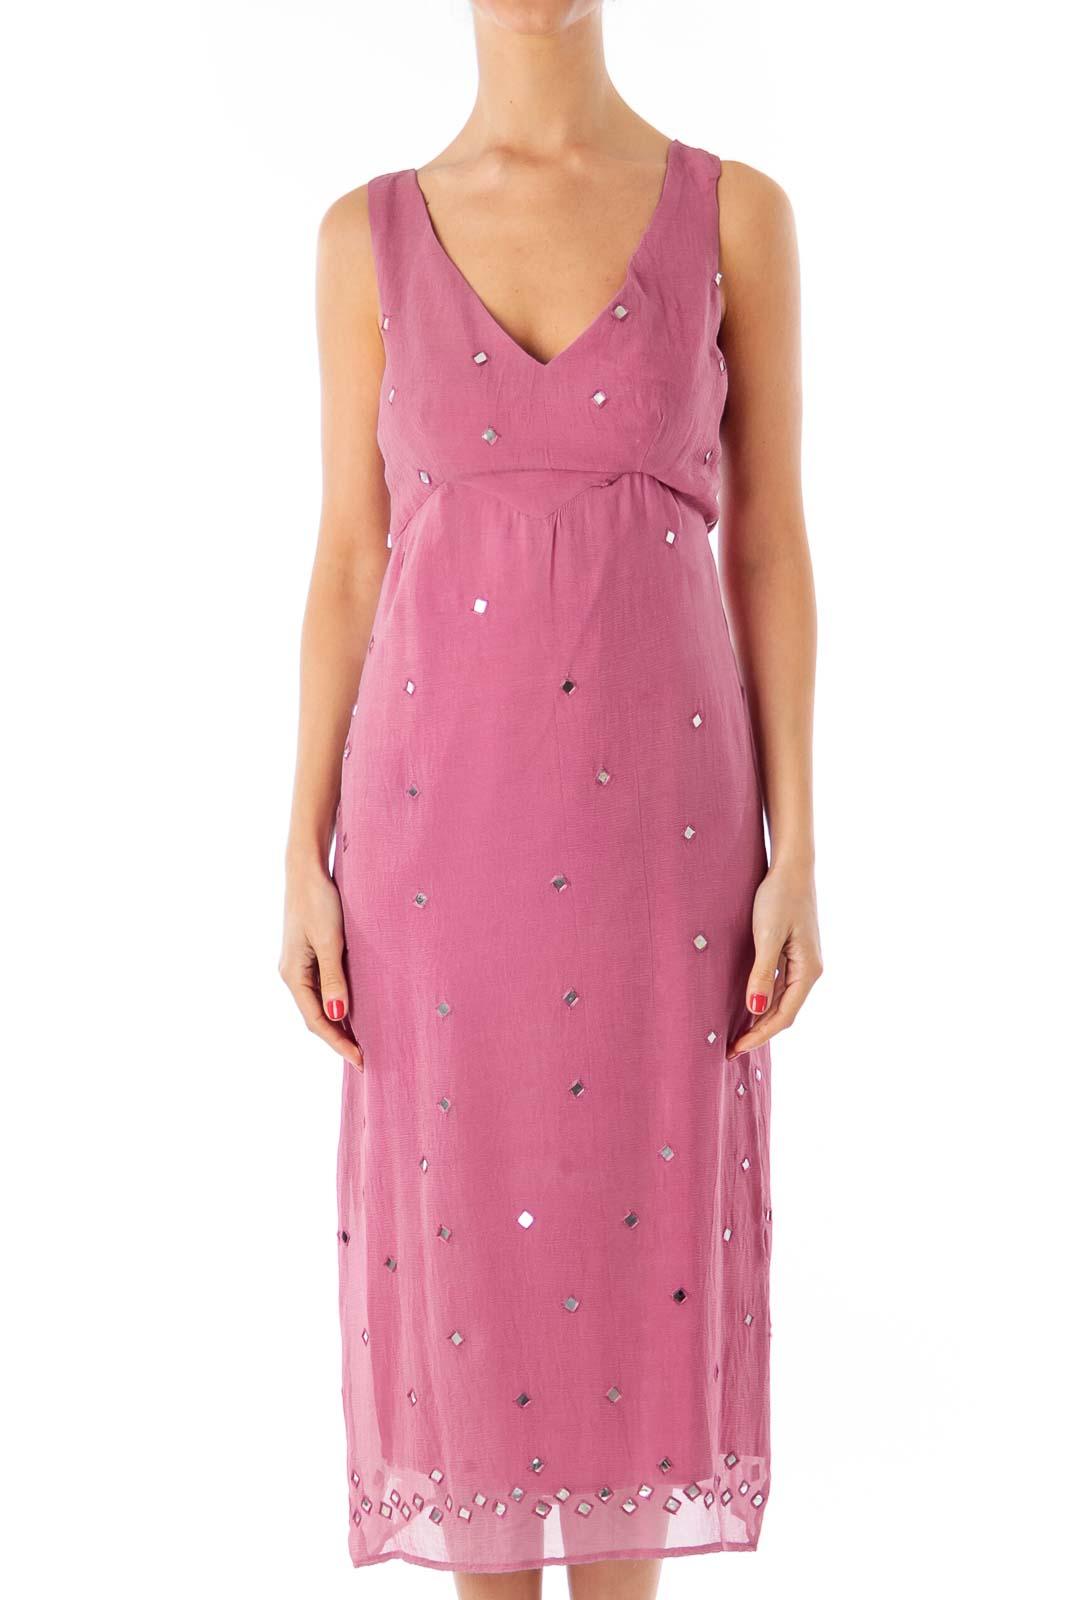 Pink Chiffon Mirror Detail Dress Front